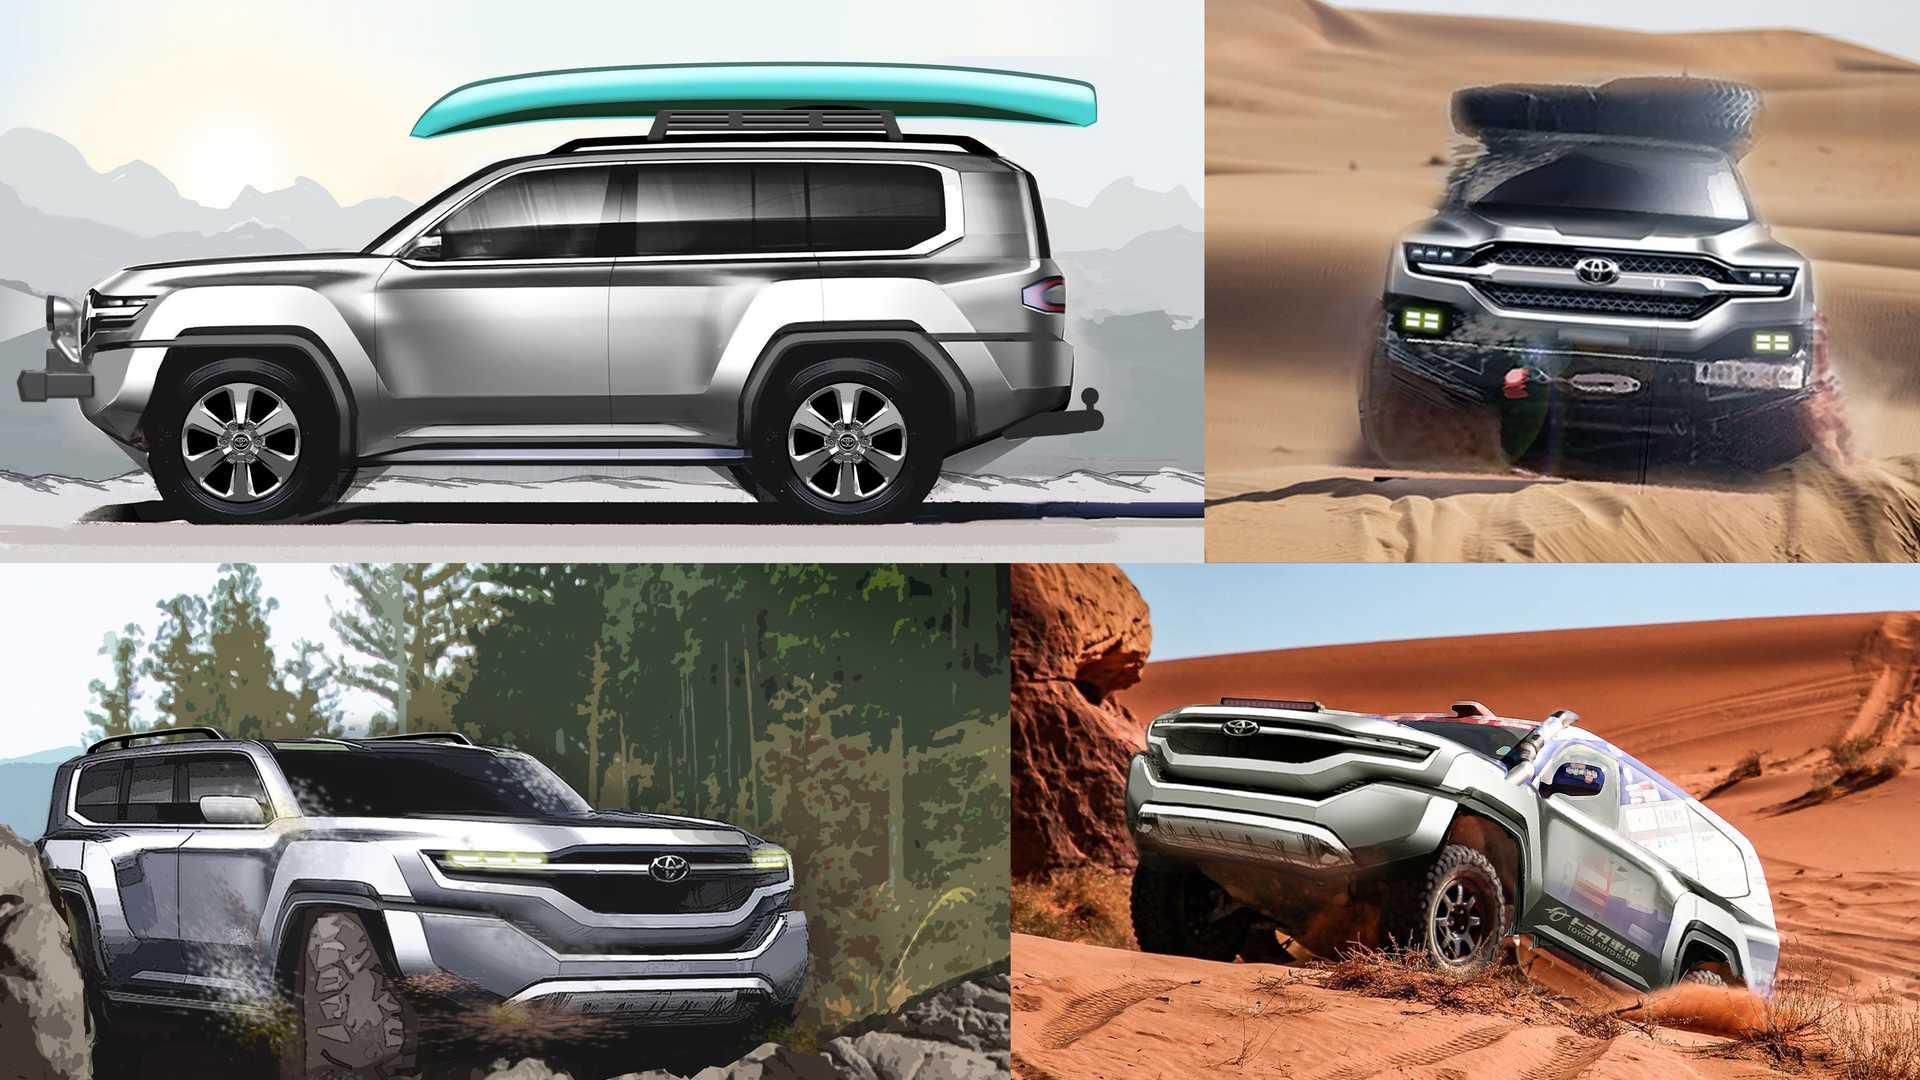 Toyota-Land-Cruiser-design-sketches-3